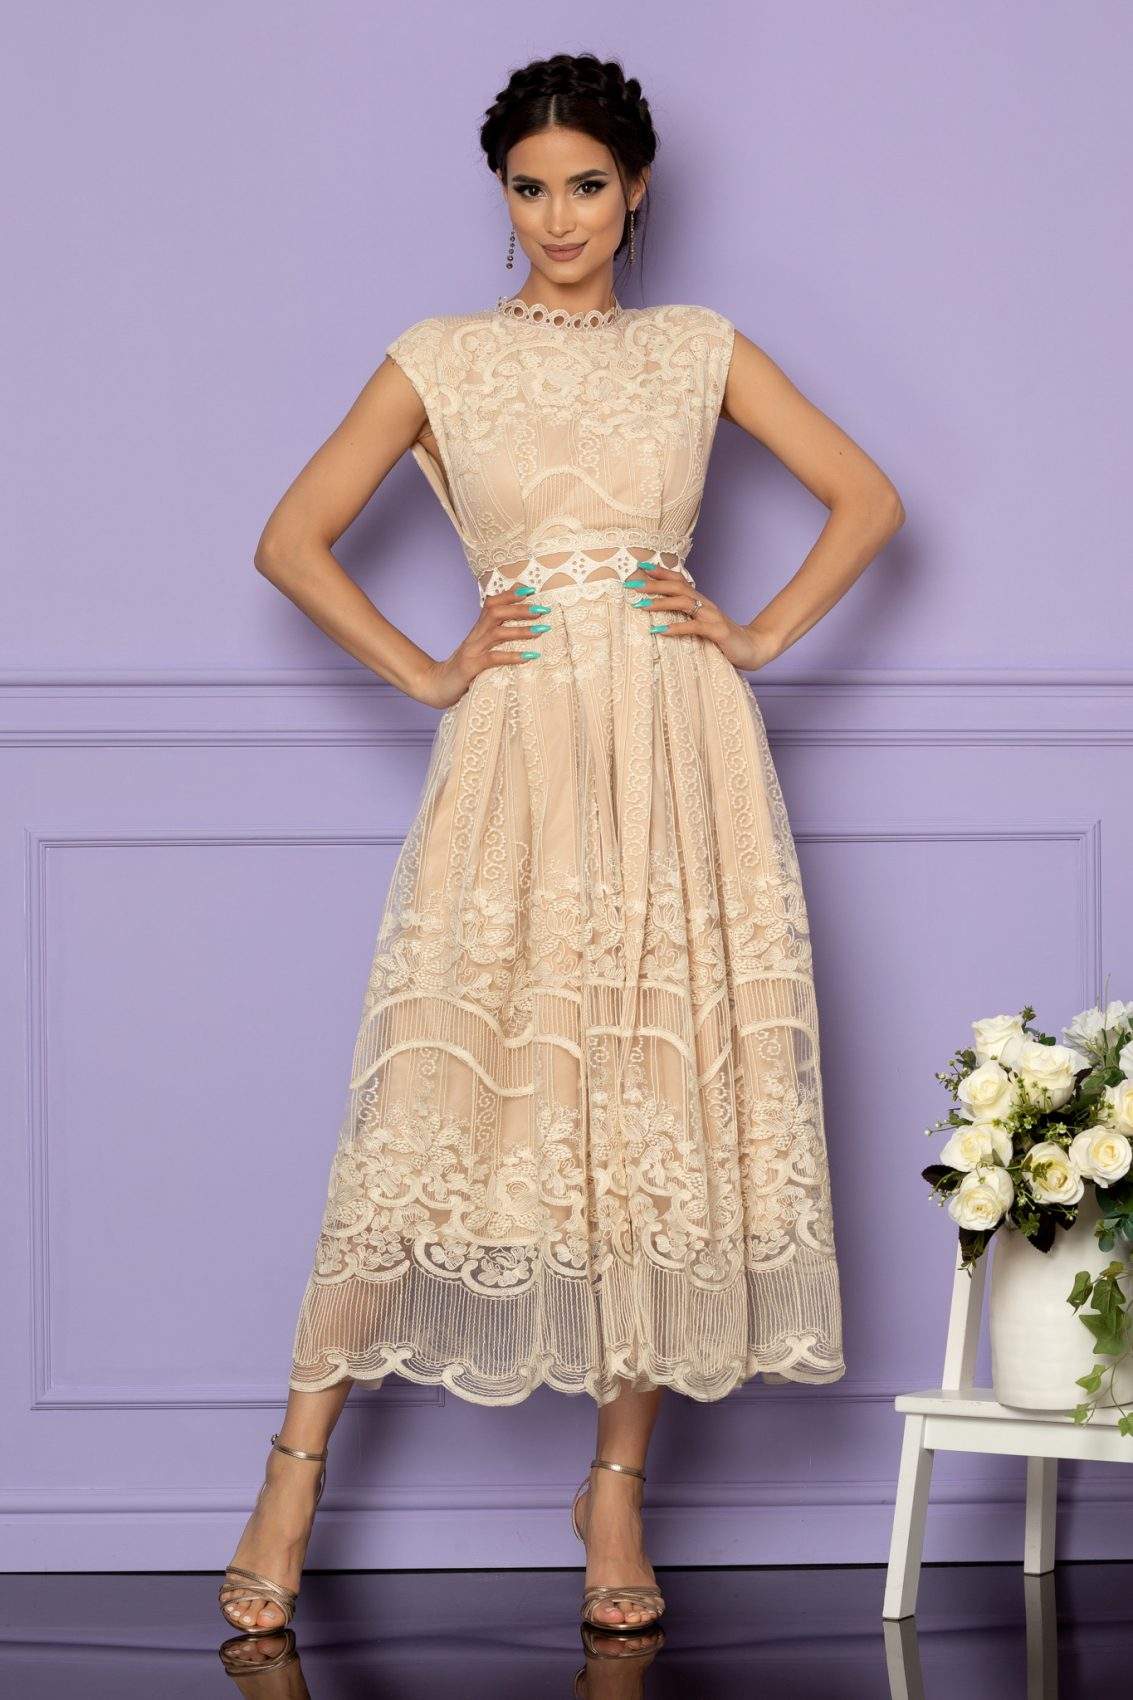 Nude Αμπιγιέ Φόρεμα Από Δαντέλα Valore A594 1